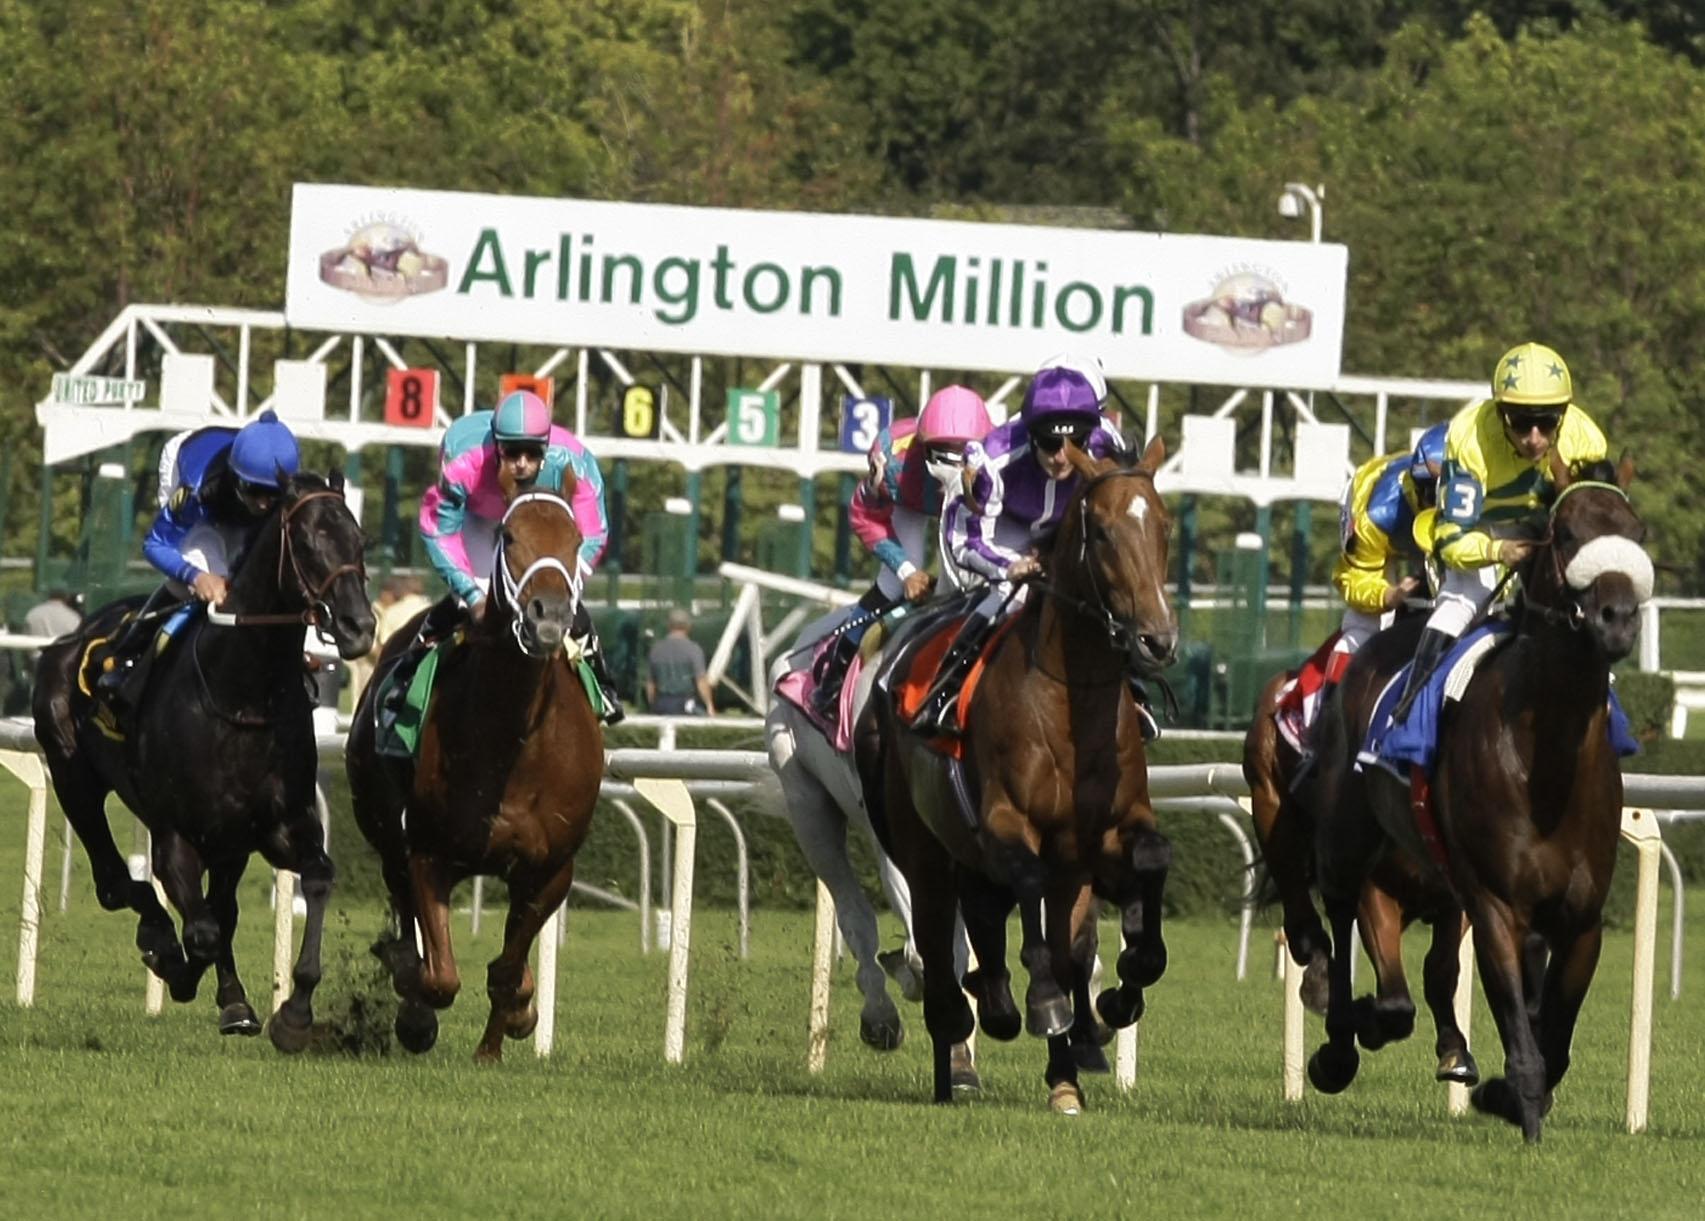 Spirit One, right, from France, ridden by Loritz Mendizabal, leads the Arlington Million pack at Arlington International Racecourse in 2008.